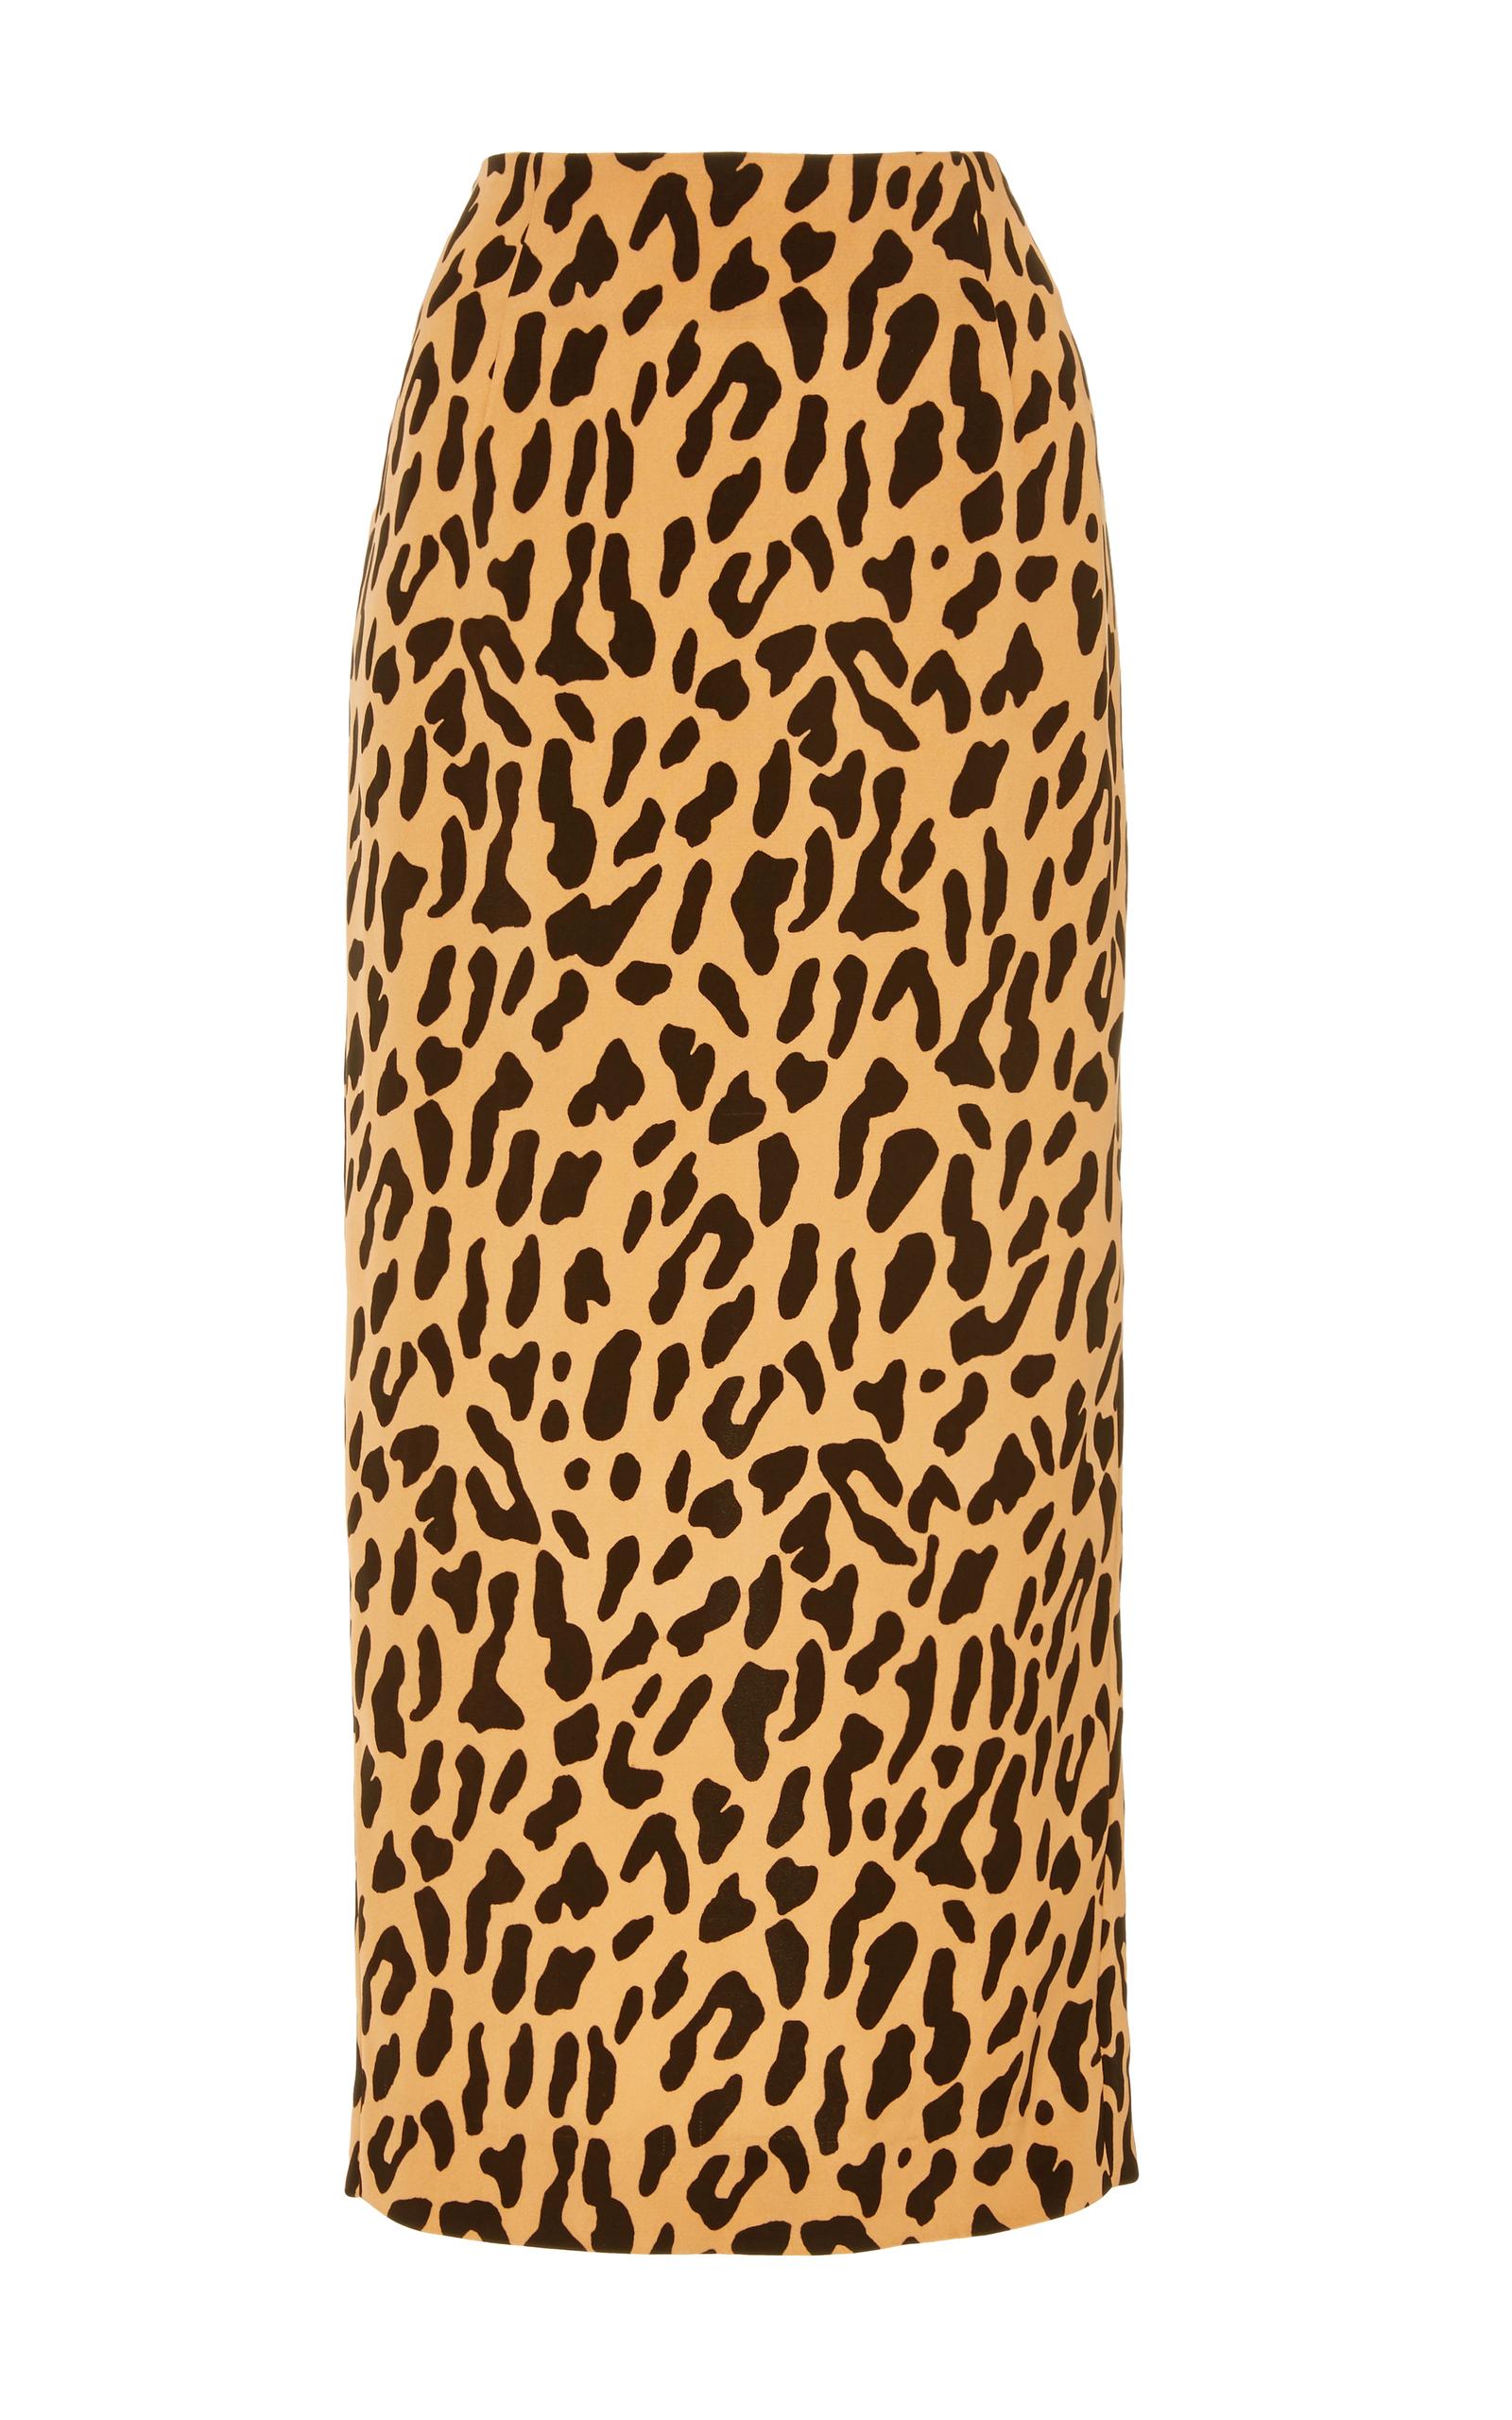 9a31d9a503 Tailored Midi Pencil Skirt by Diane von Furstenberg | Moda Operandi